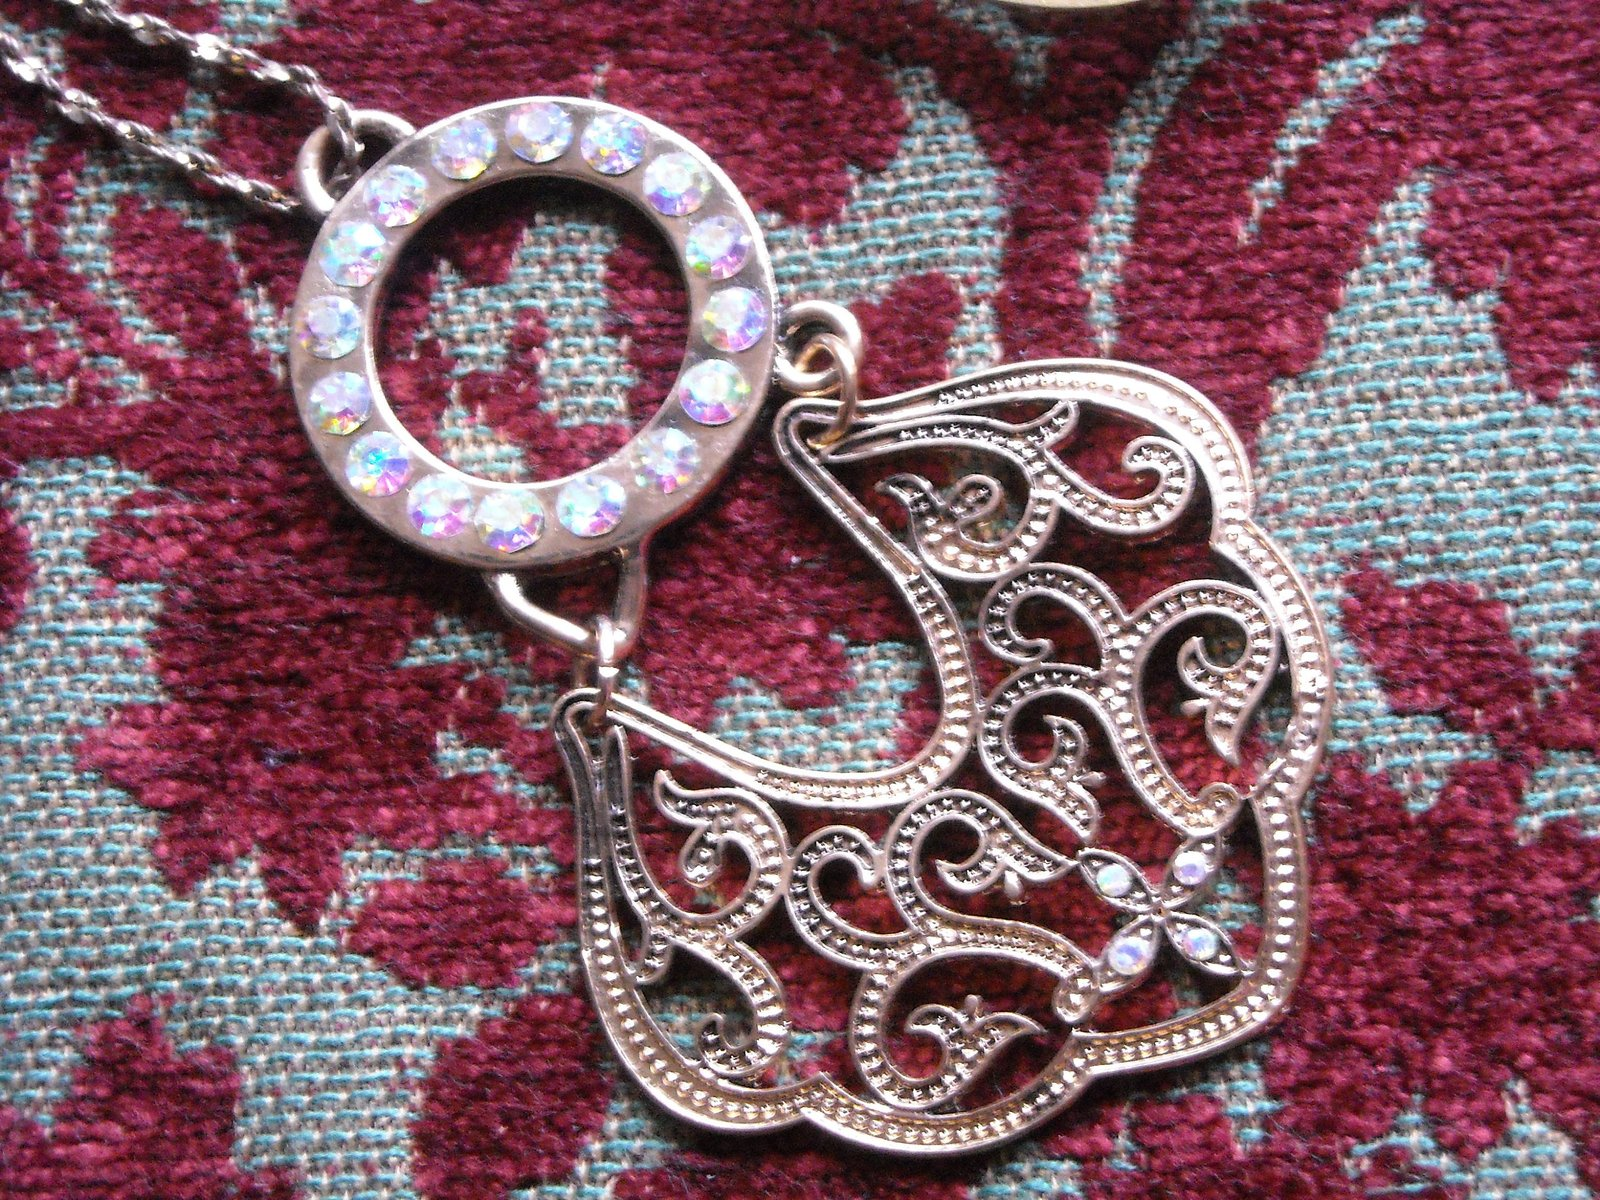 Necklace Gold Tone Filigree Metal & Aurora Borealis Rhinestones Gold Tone Chain image 5